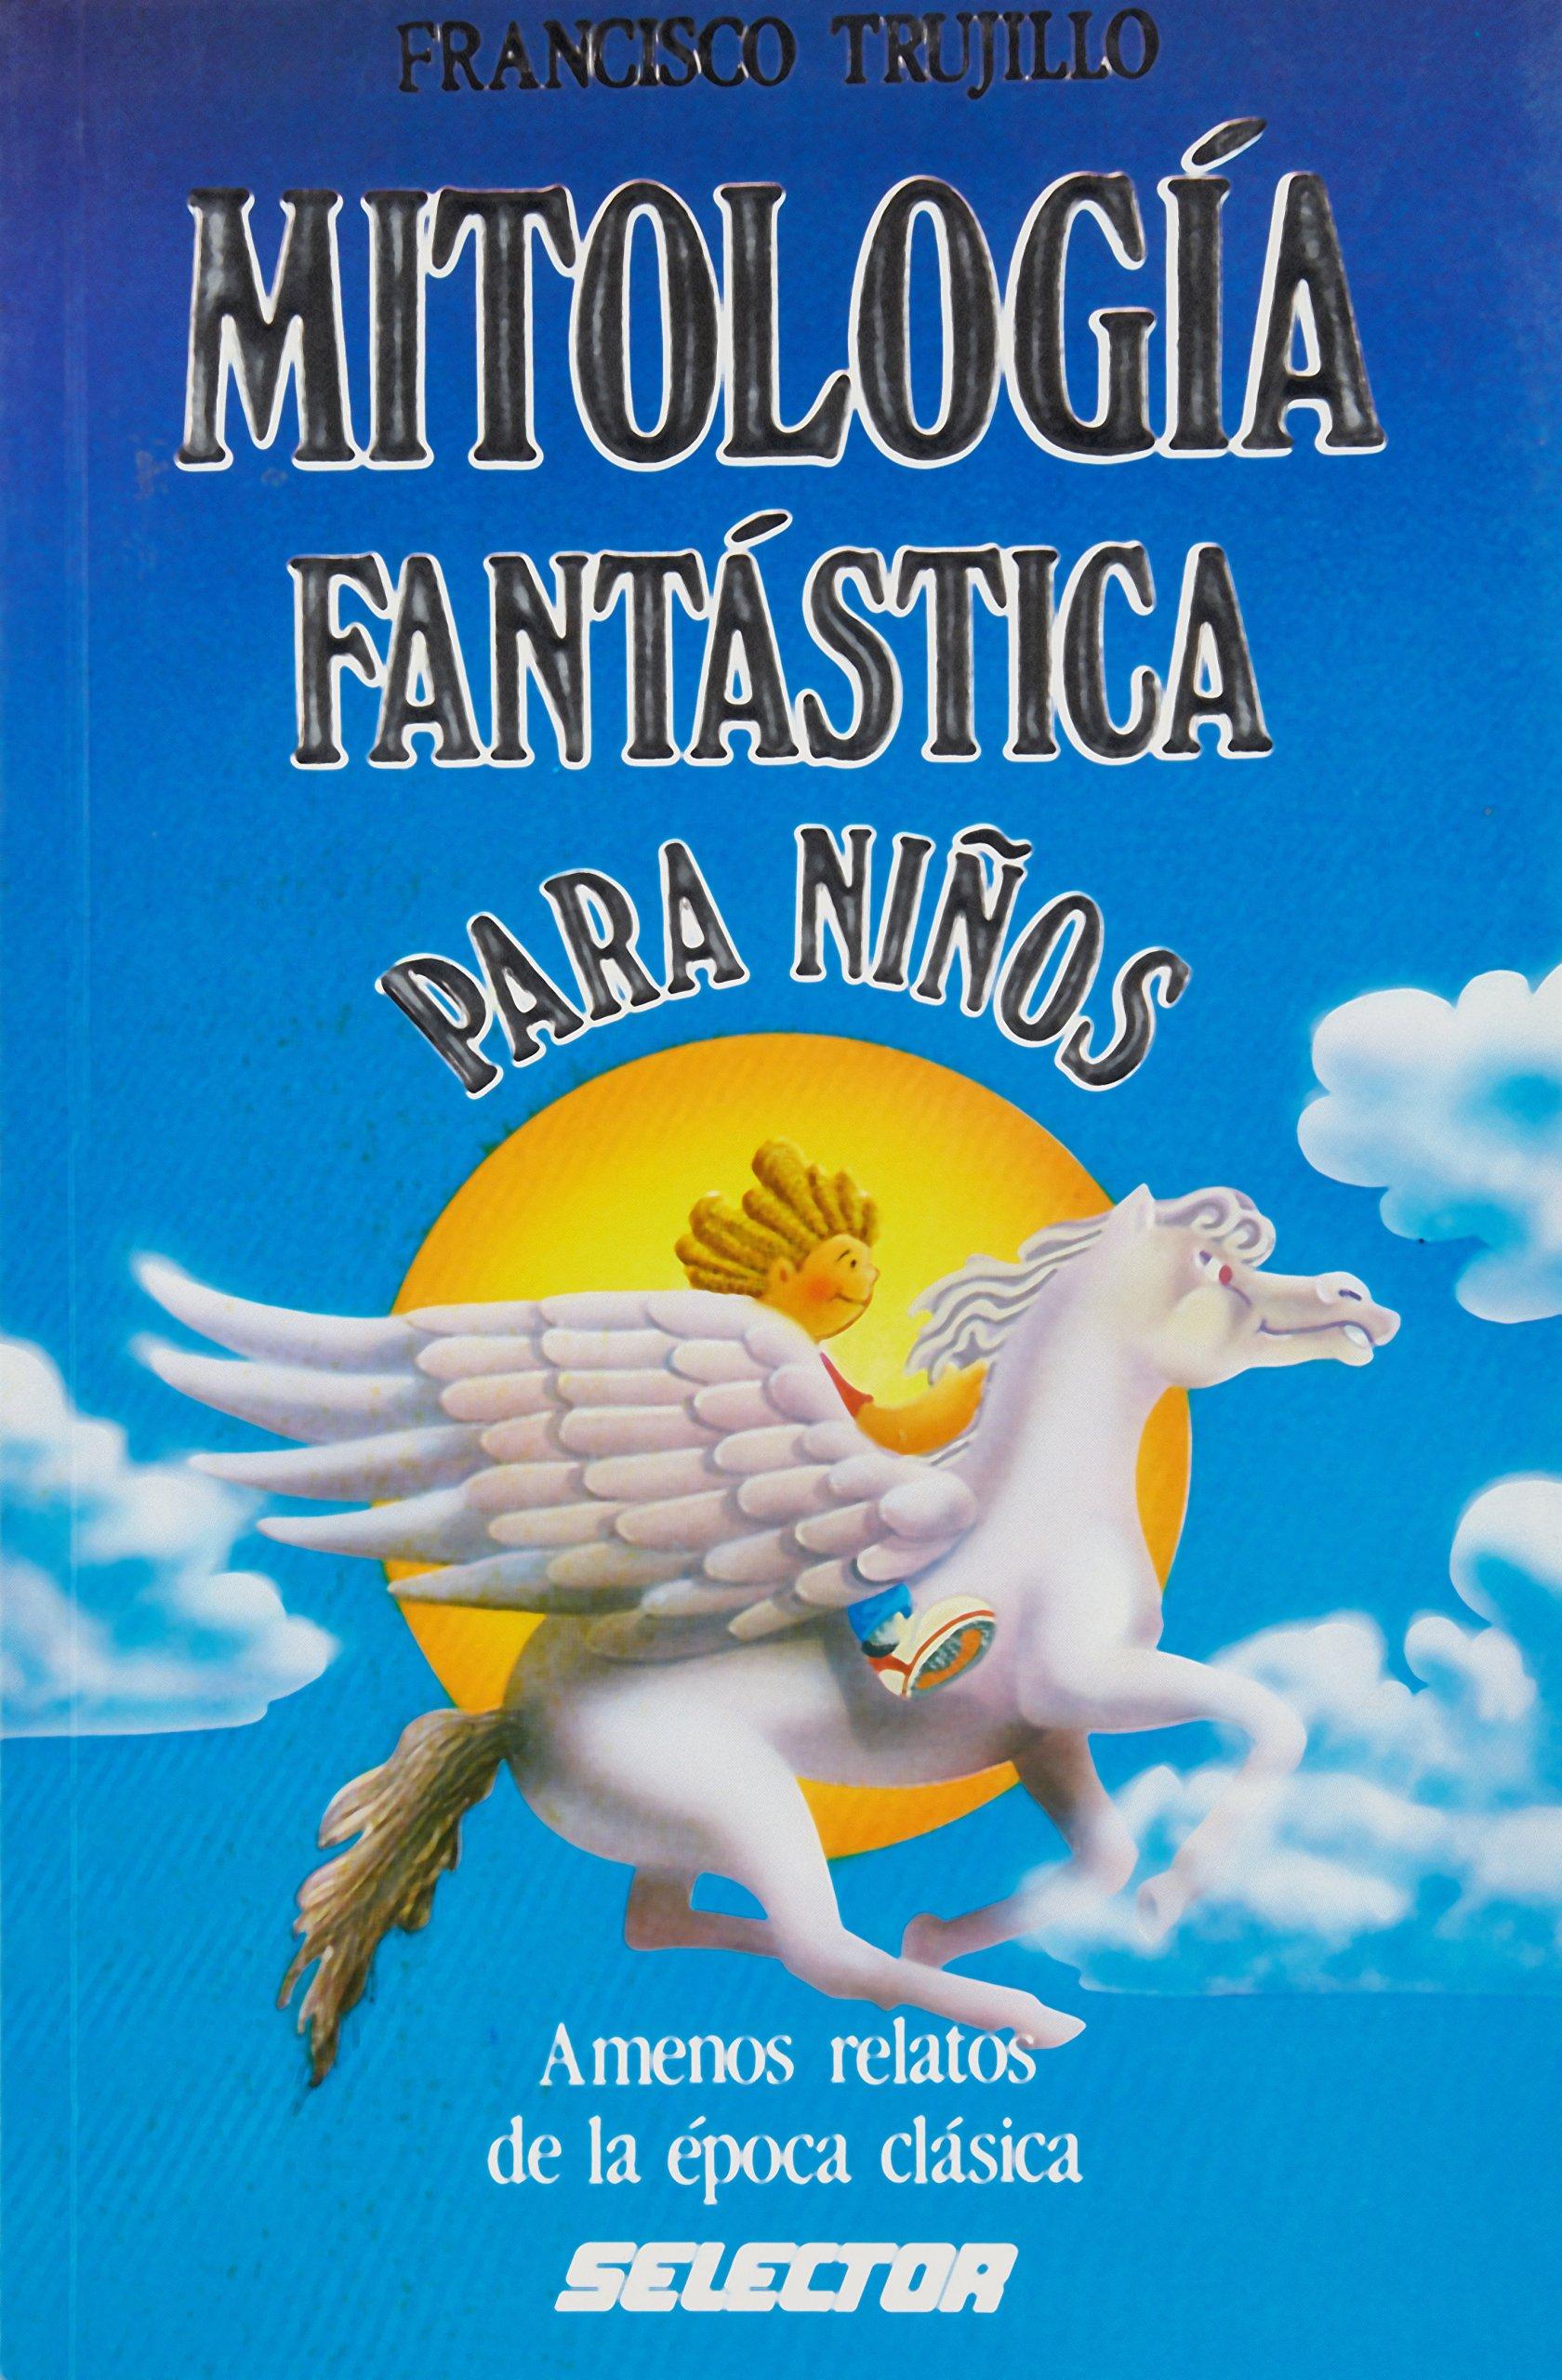 Mitologia Fantastica Para Ninos/ Fantastic Mythology for Children: Amazon.es: Trujillo, Francisco: Libros